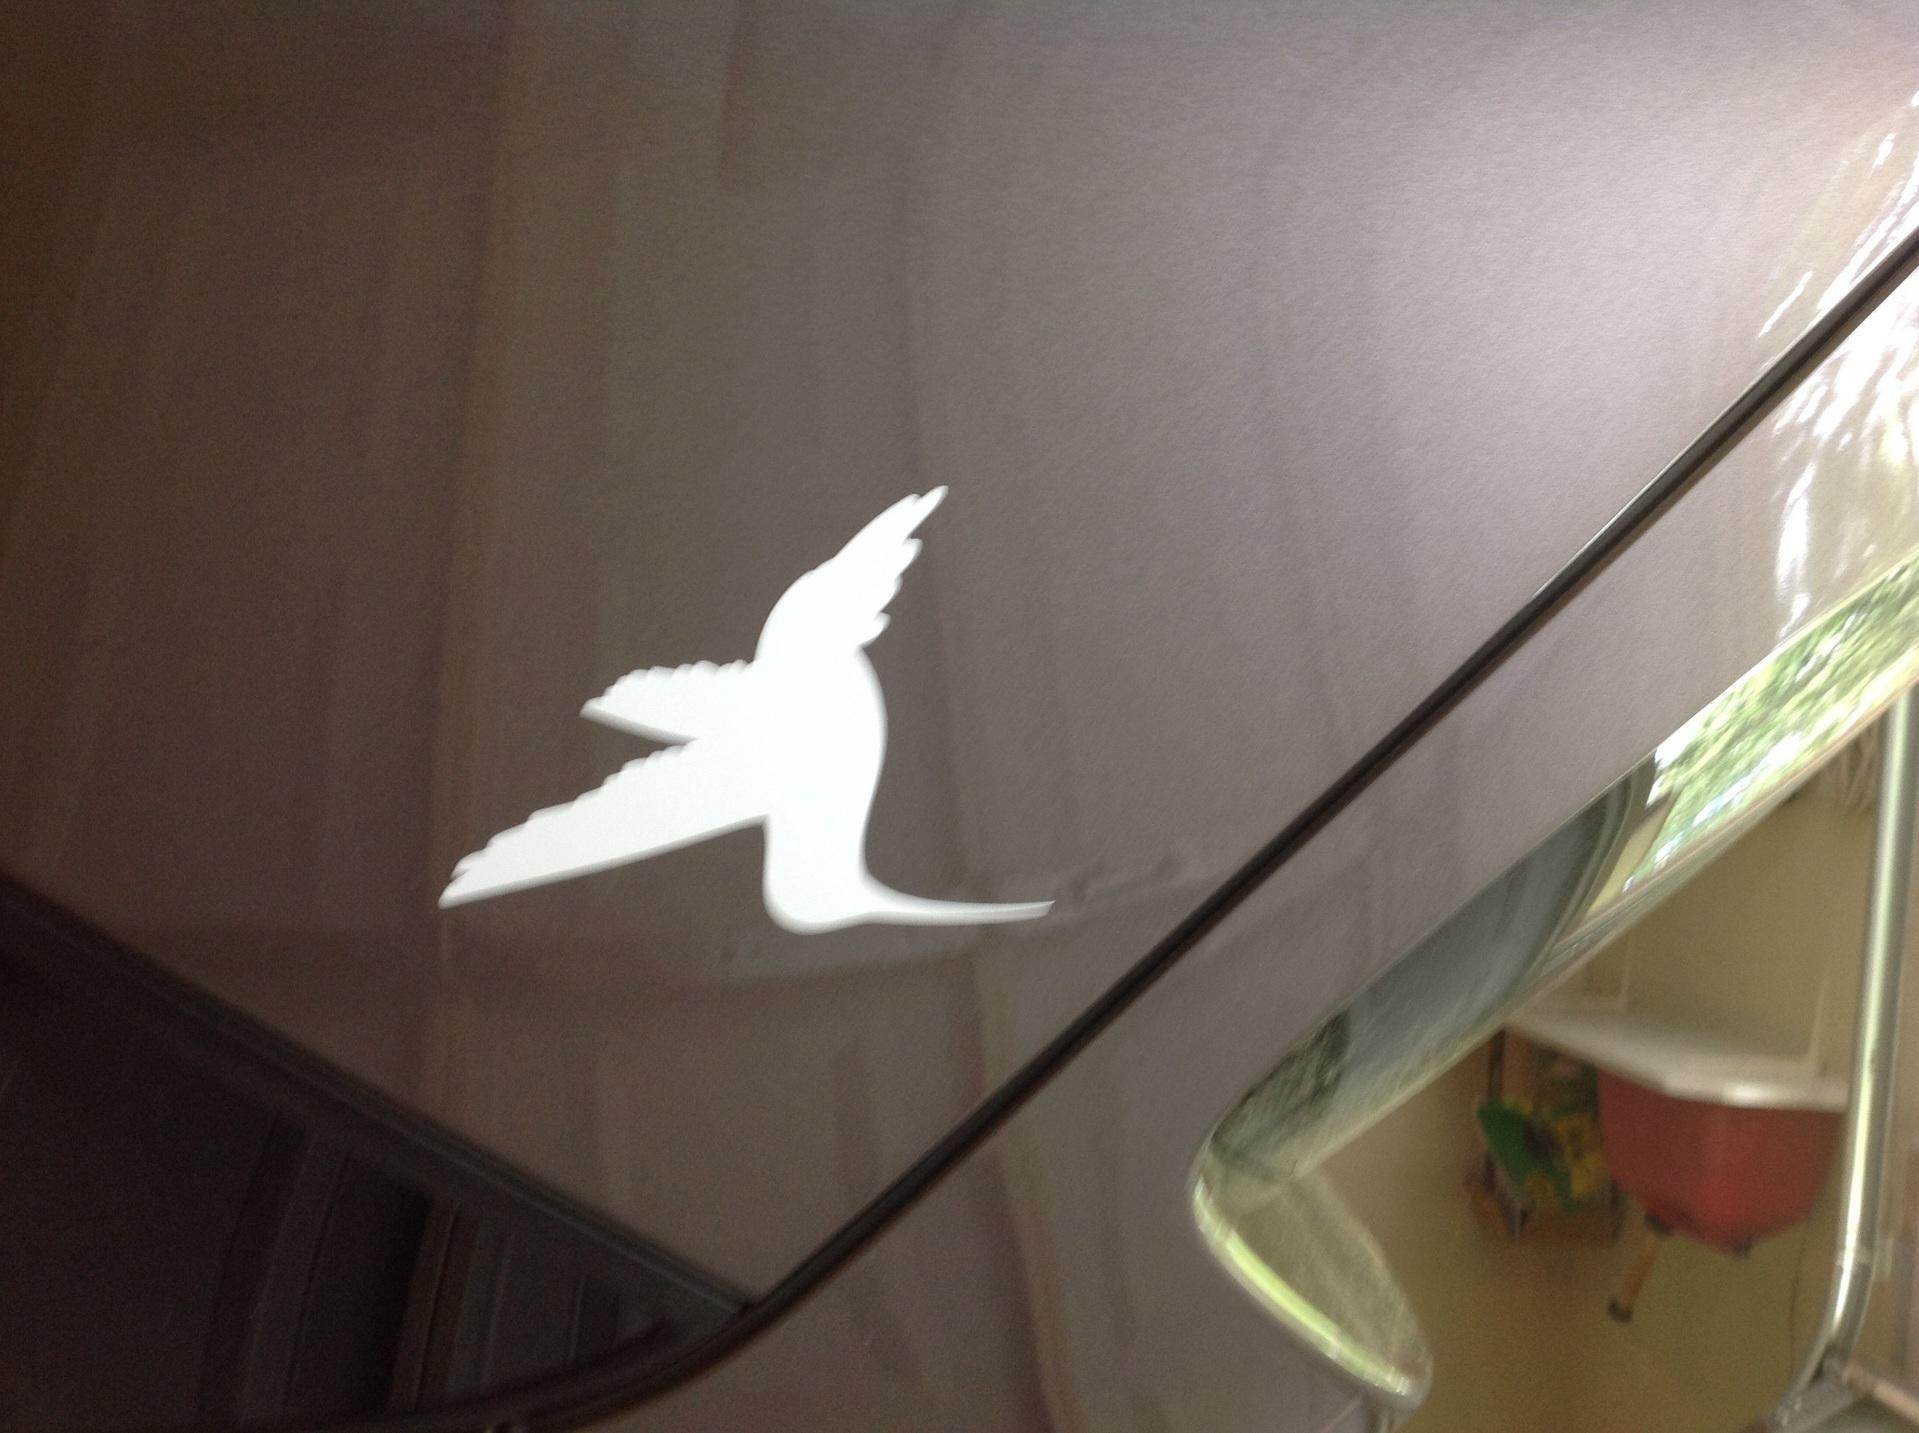 Heather's photograph of their Hummingbird Silhouette Sticker